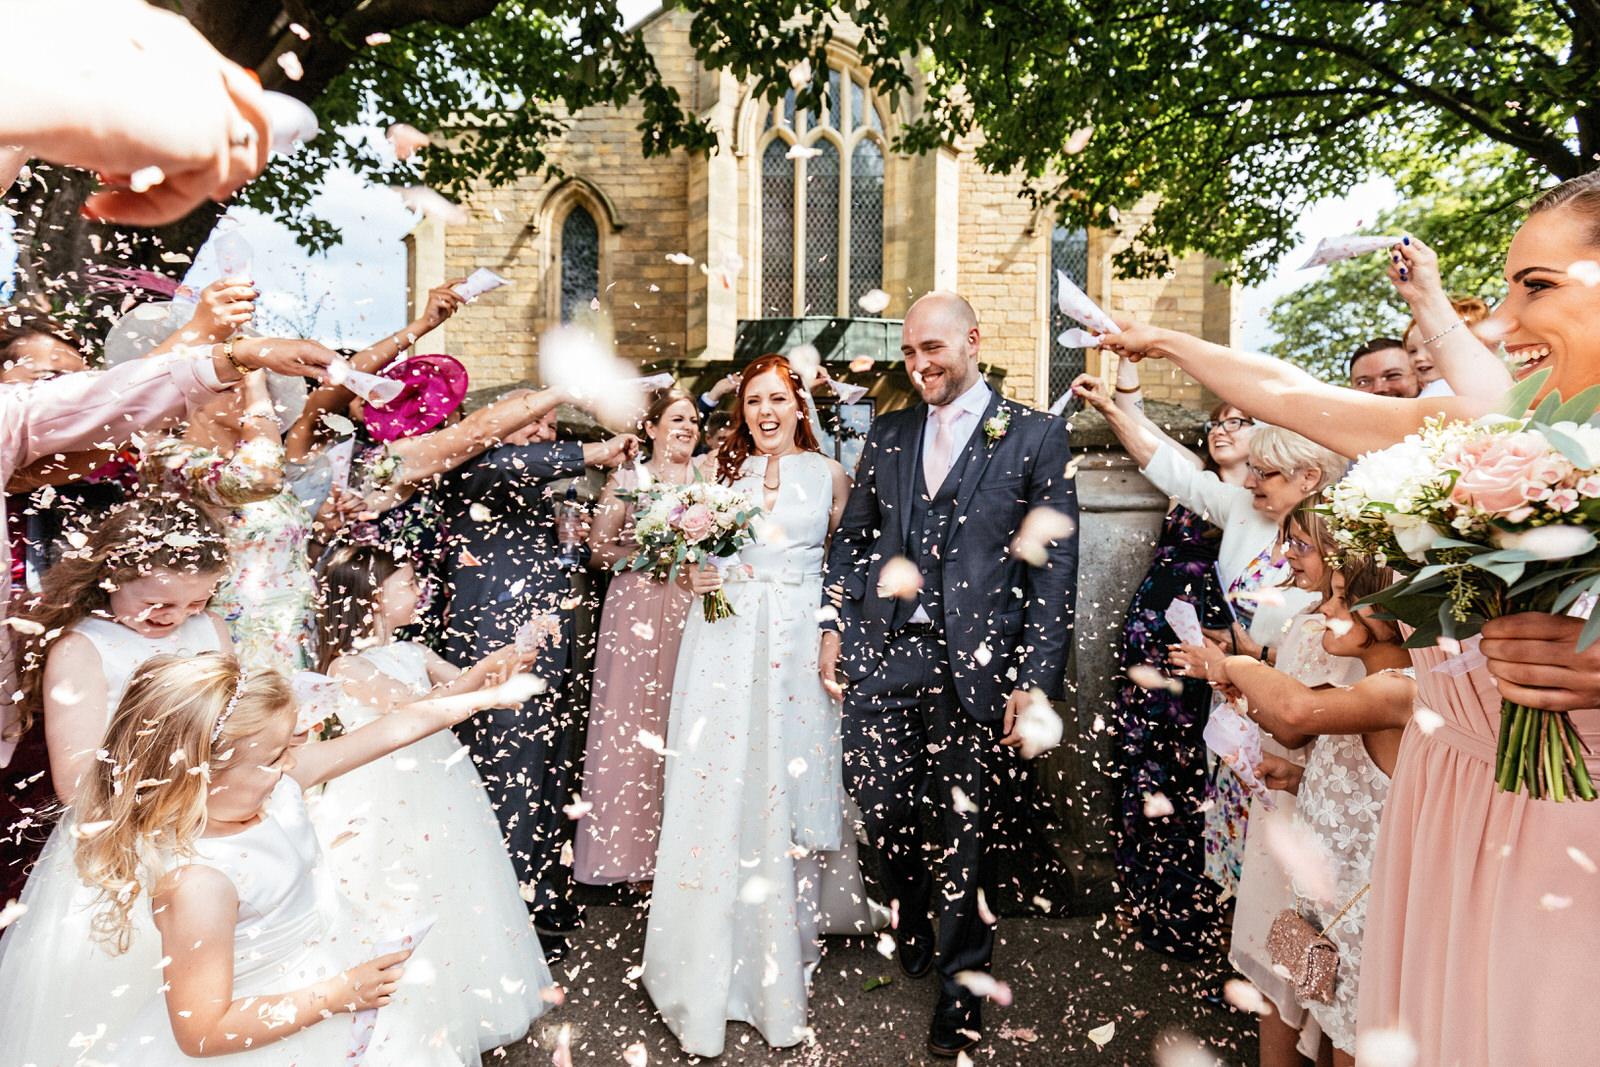 Beamish-Hall-Wedding-Photographer-021.jpg